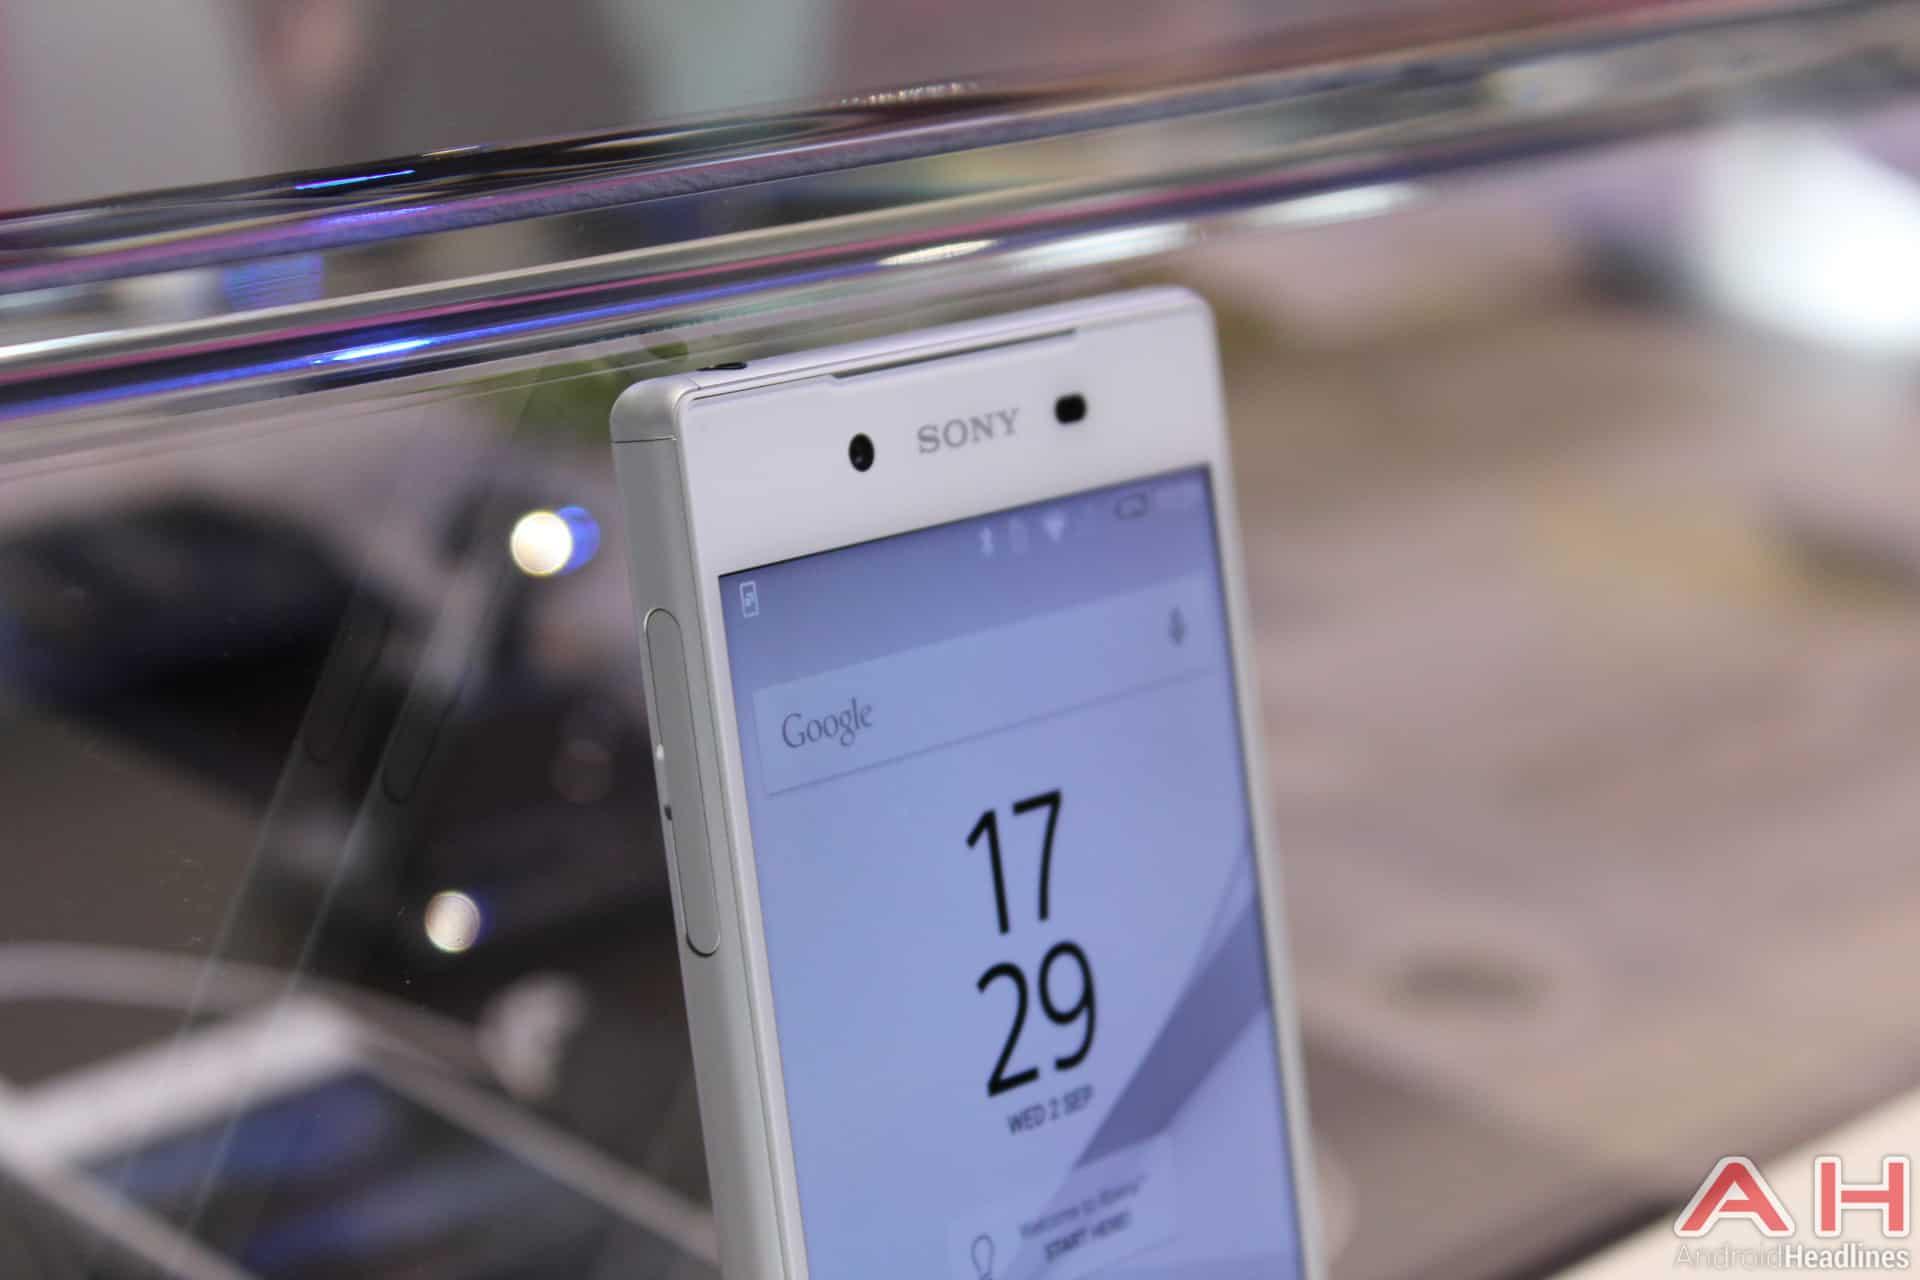 Sony Xperia Z5 IFA AH 9